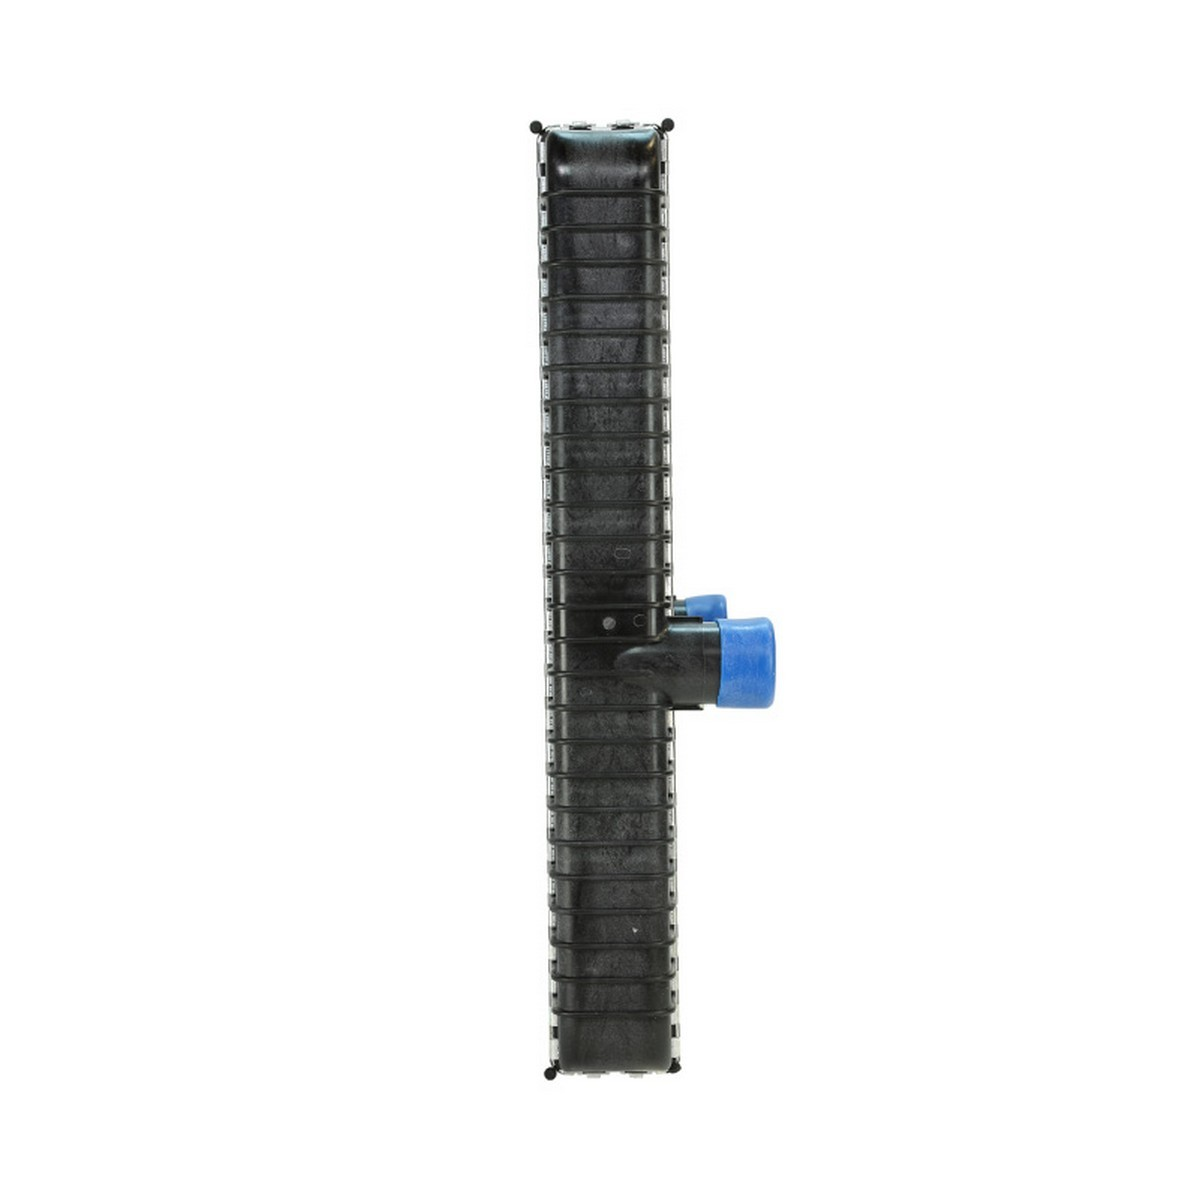 international 3000 7900 series 02 07 radiator oem 2509358c92 8